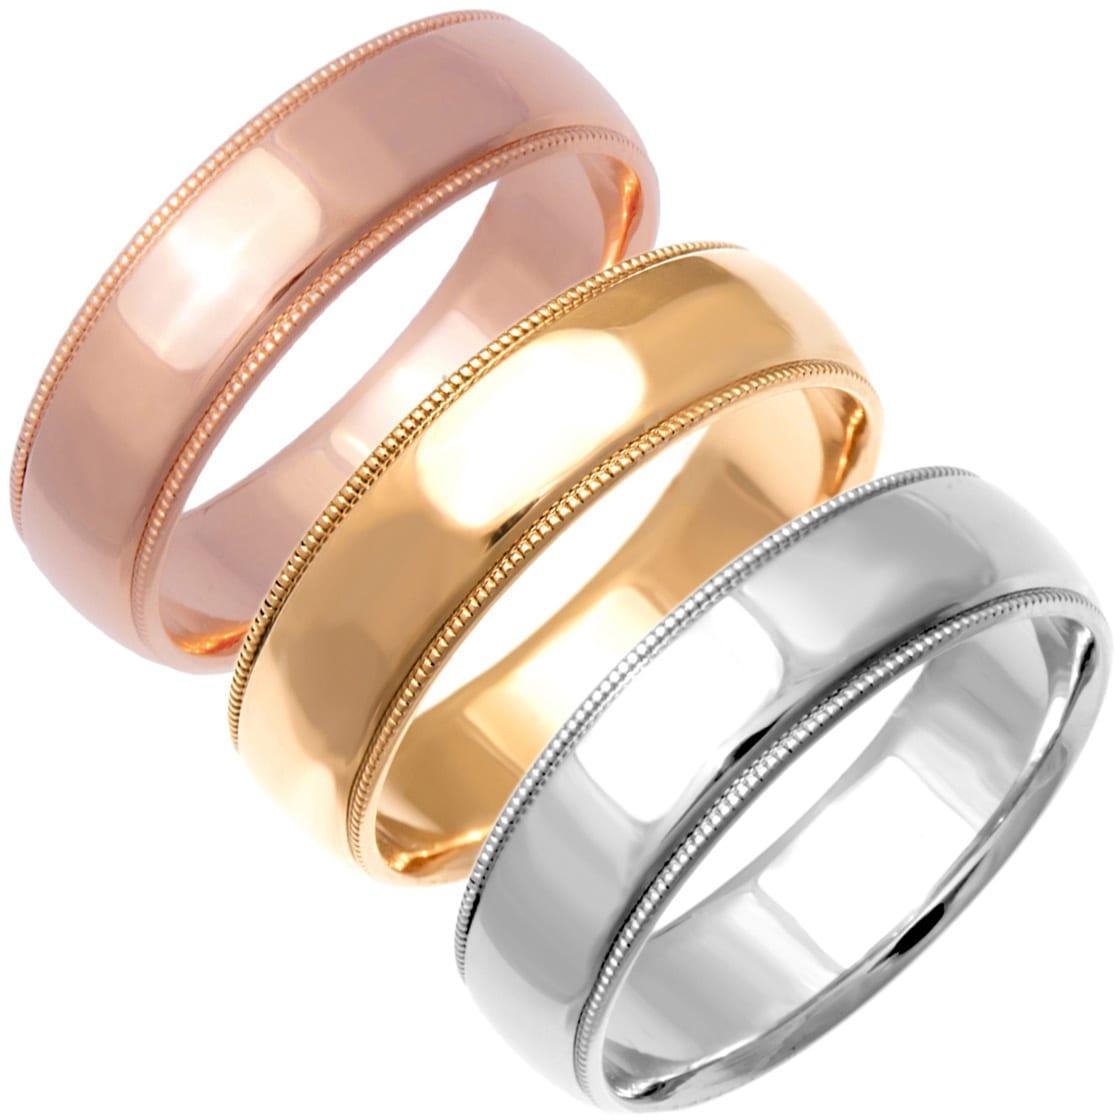 Men s Wedding Bands Groom Wedding Rings Overstock Shopping